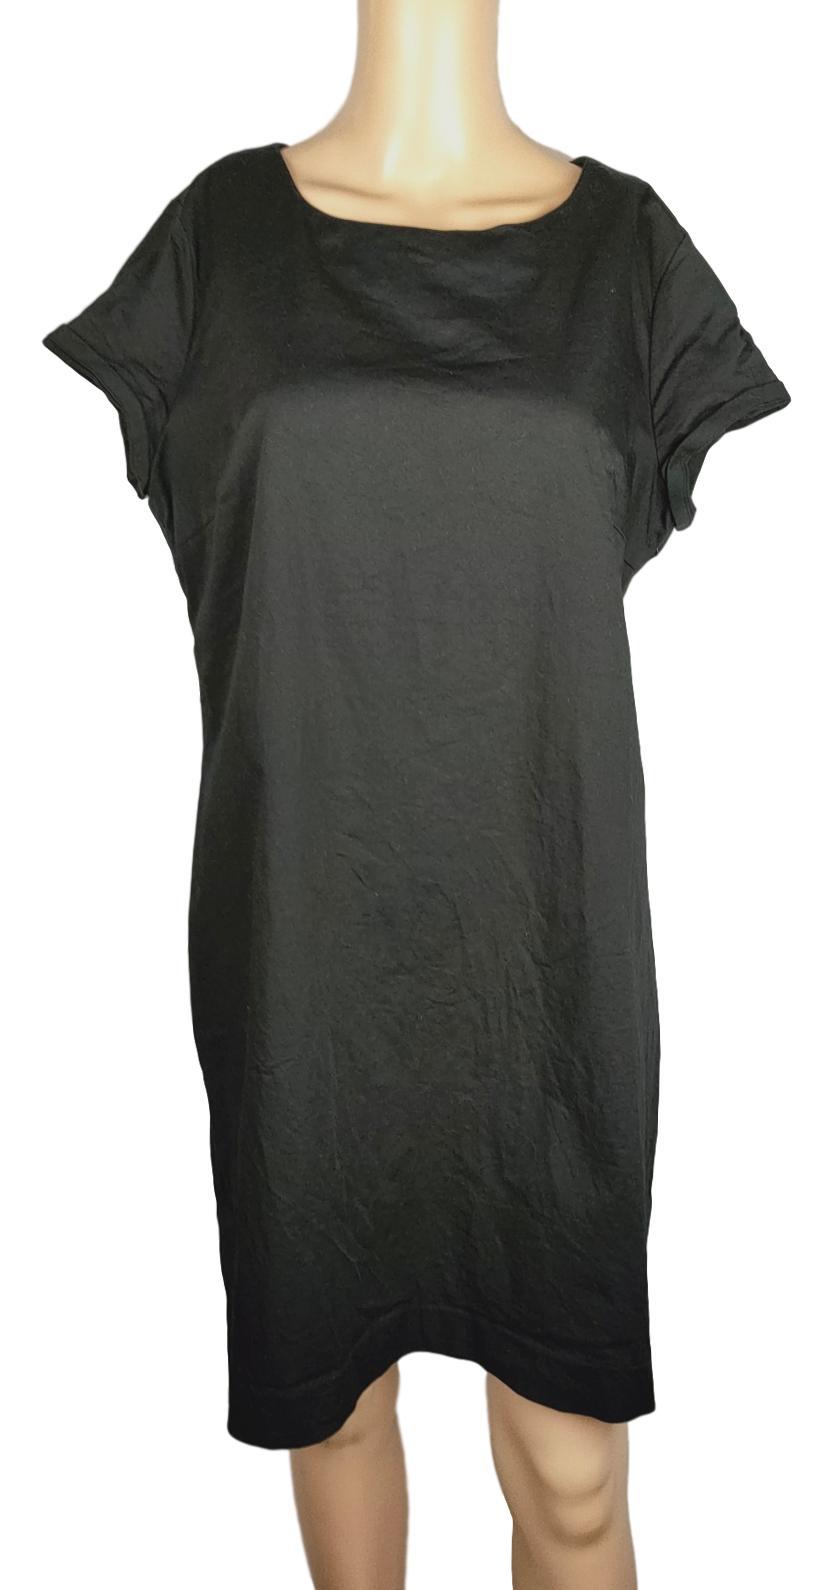 Robe - Monoprix - taille 48